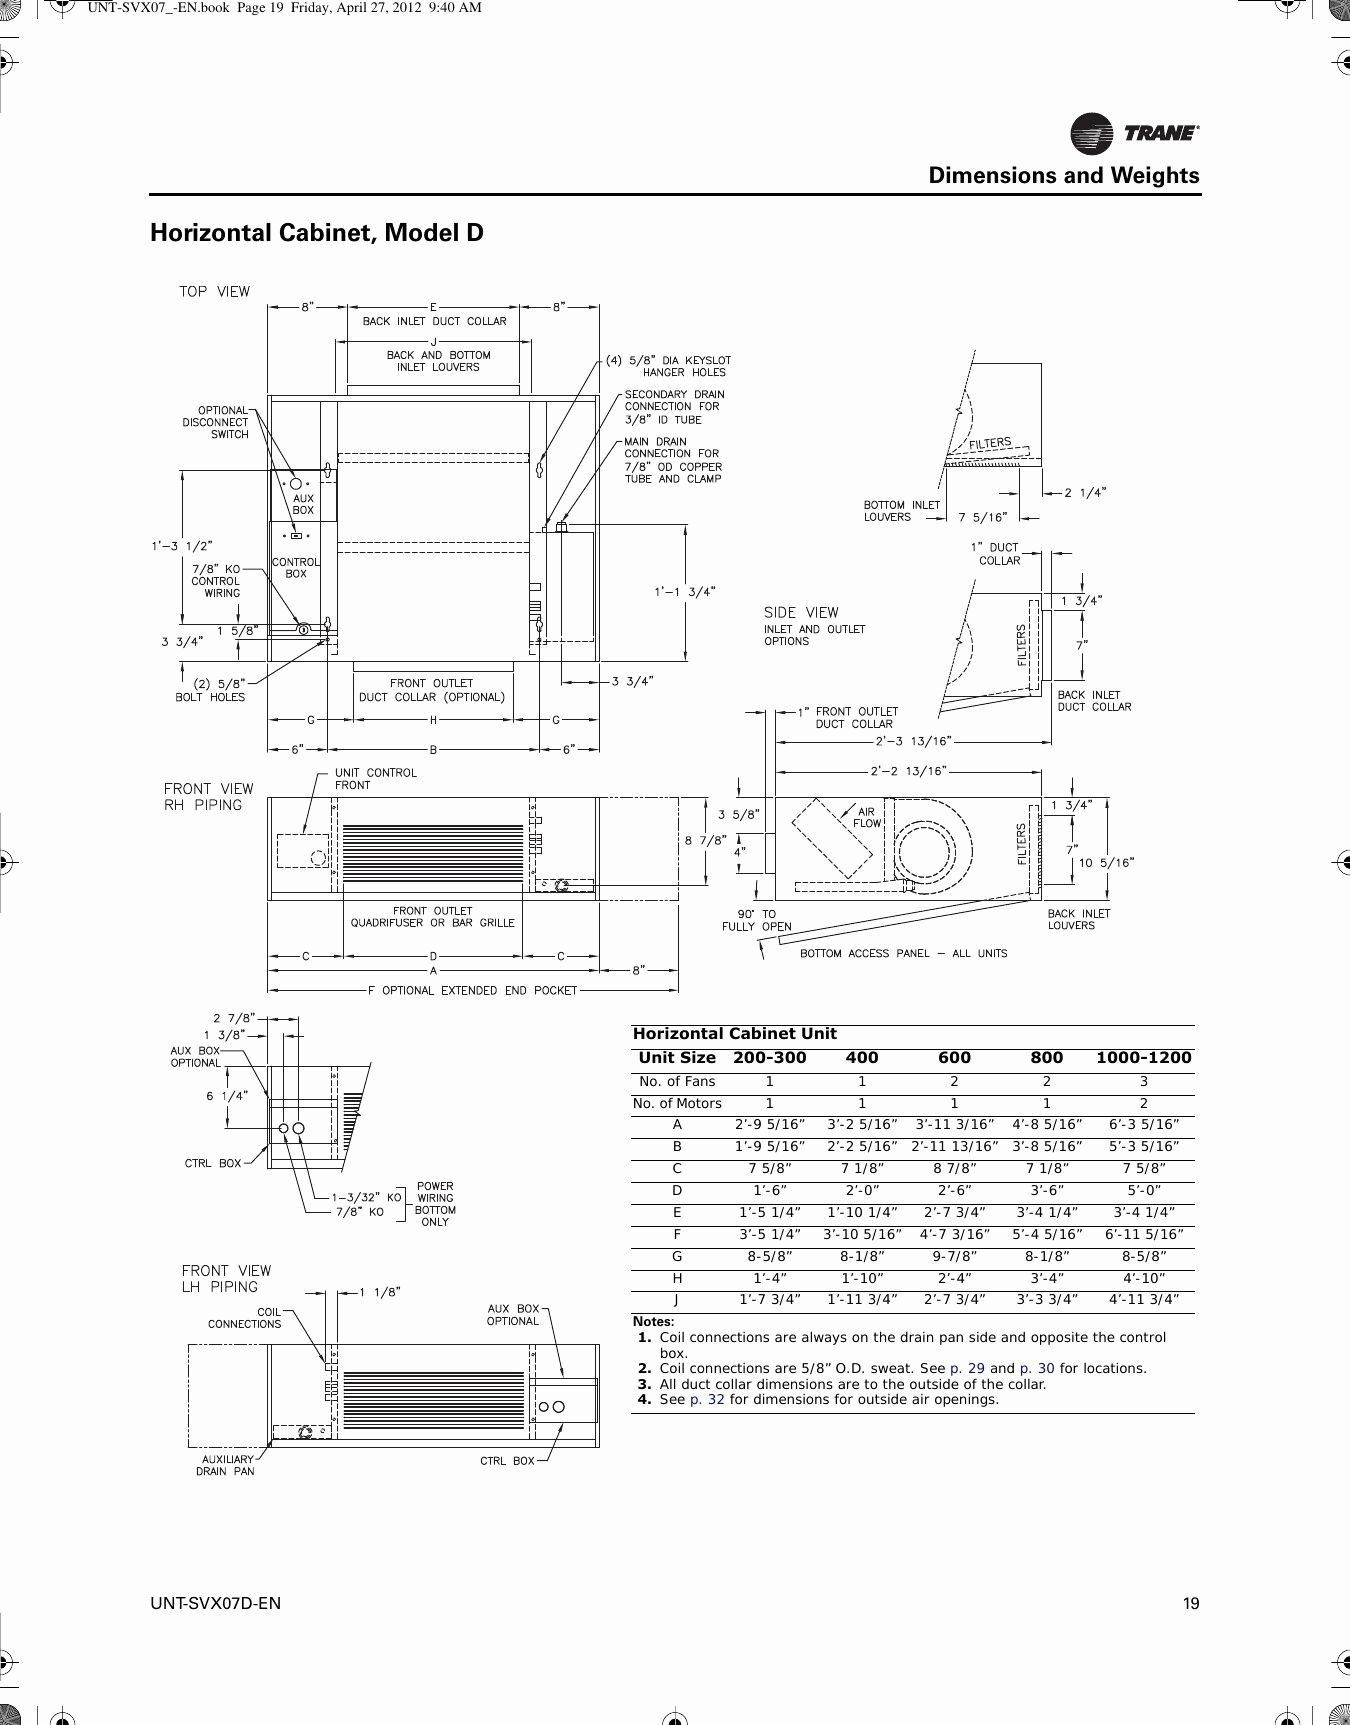 medium resolution of unique wiring diagram for underfloor heating thermostat diagrams digramssample diagramimages wiringdiagramsample wiringdiagram